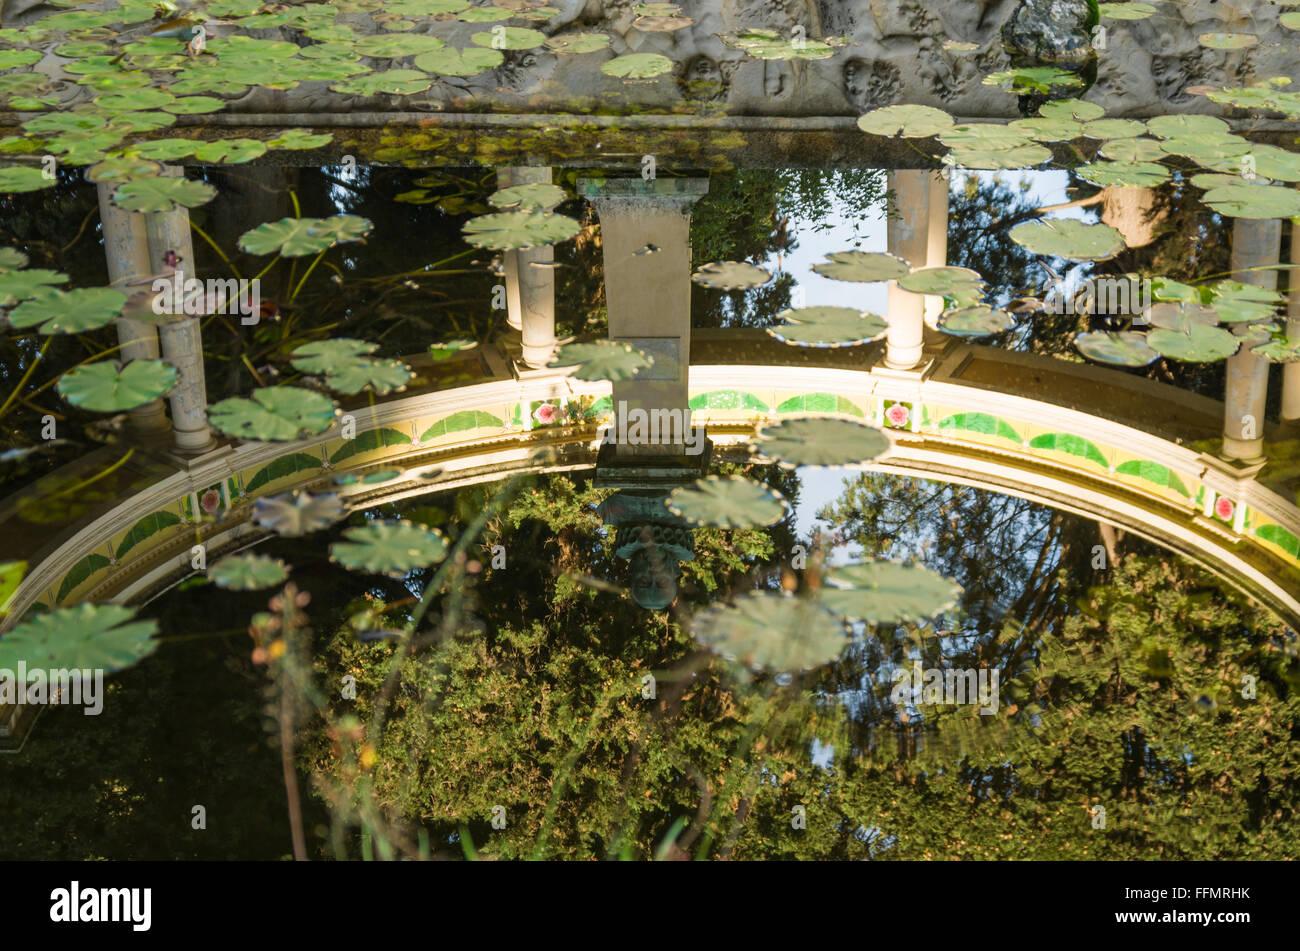 Fontana Rosa garden, Menton, PACA, France - Stock Image